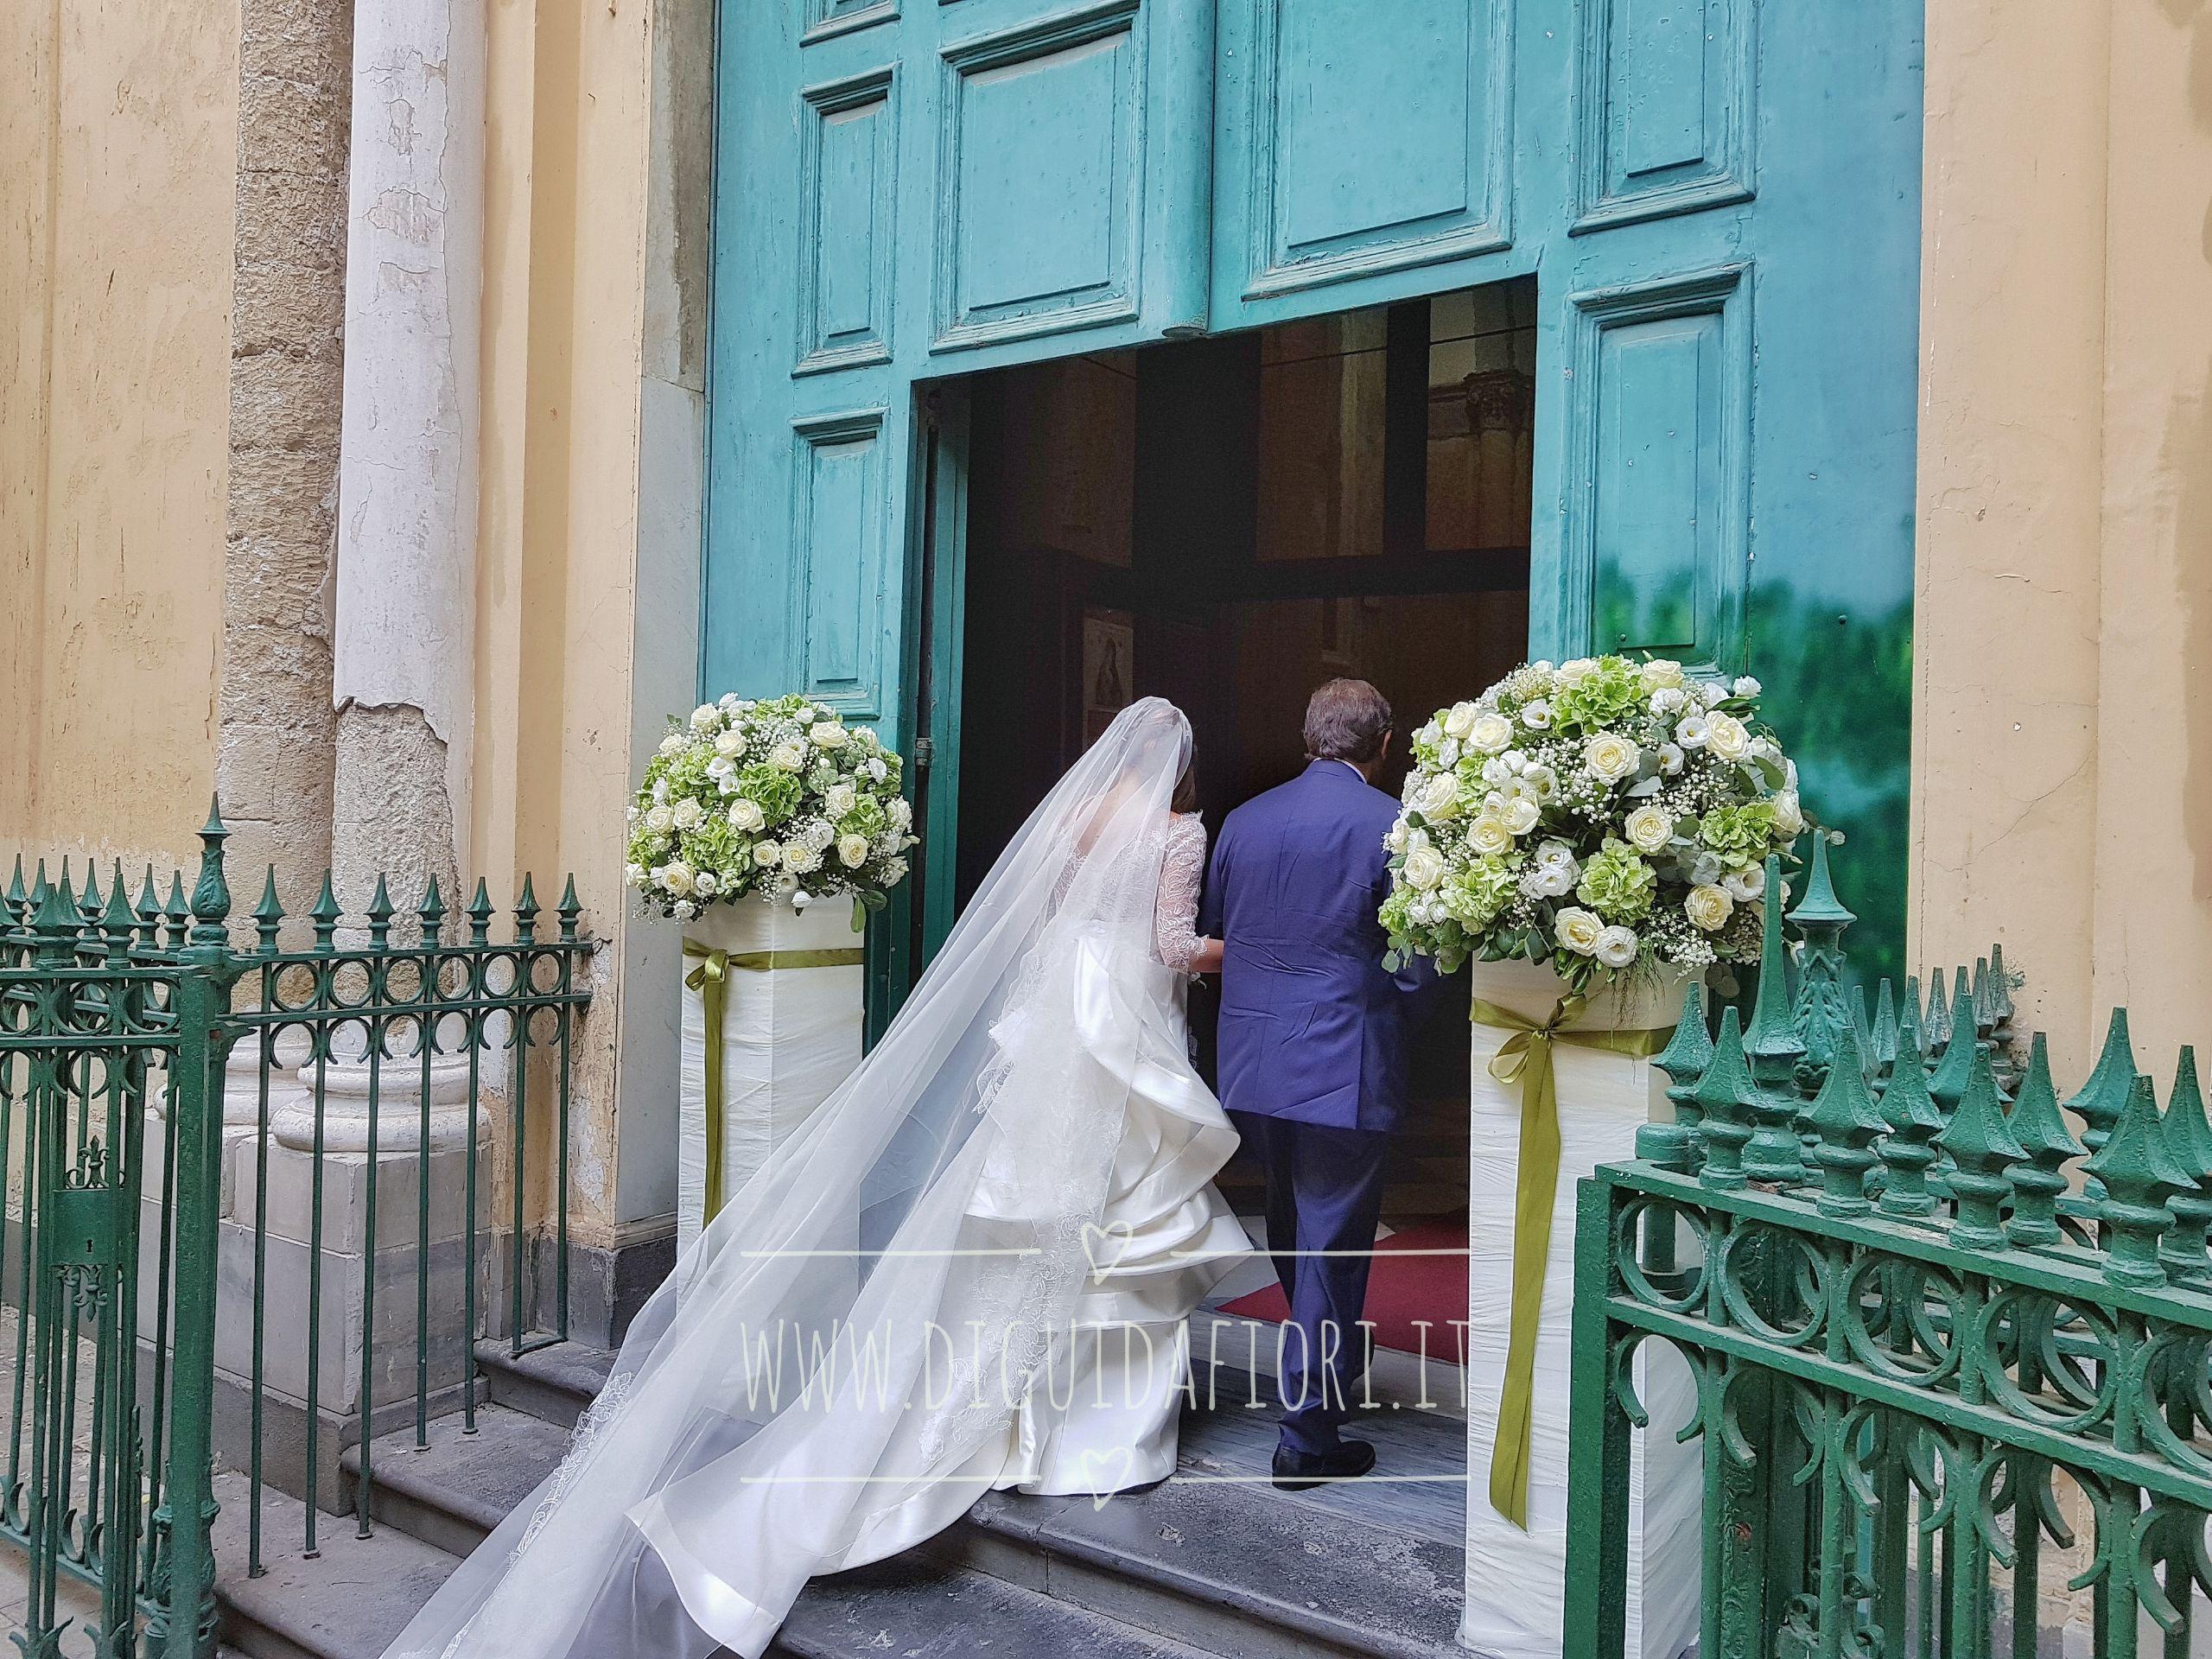 Addobbo floreale per matrimonio – Chiesa san Francesco d'Assisi Napoli